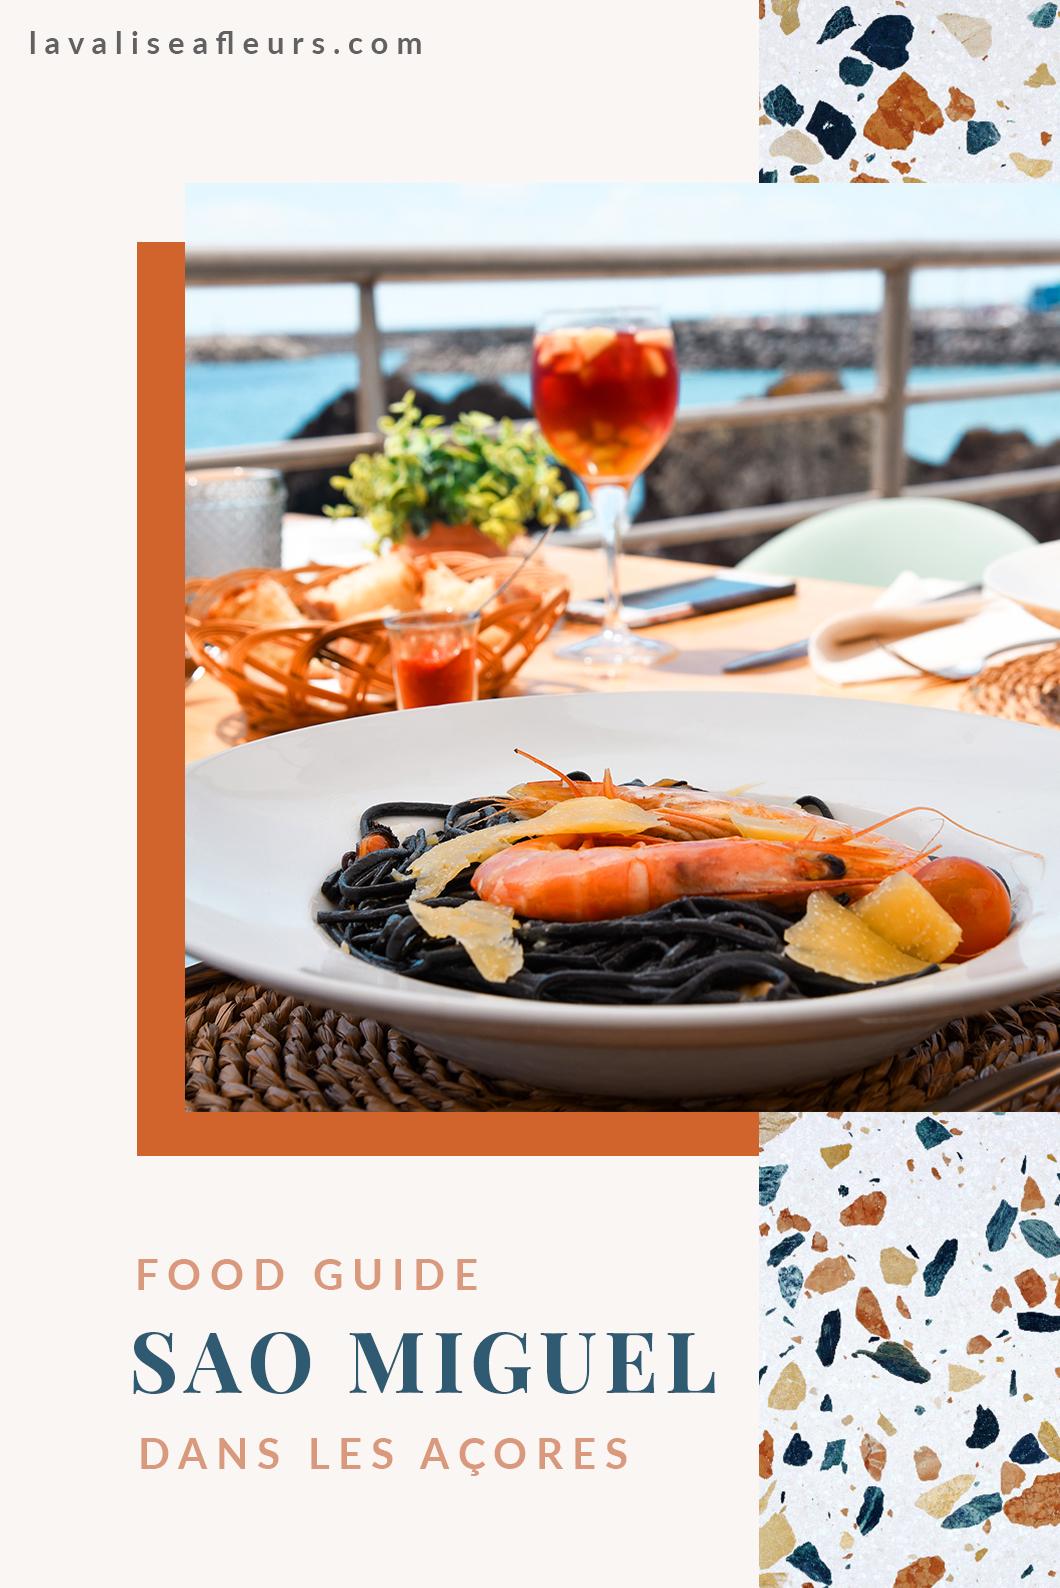 Food guide de Sao Miguel dans les Açores